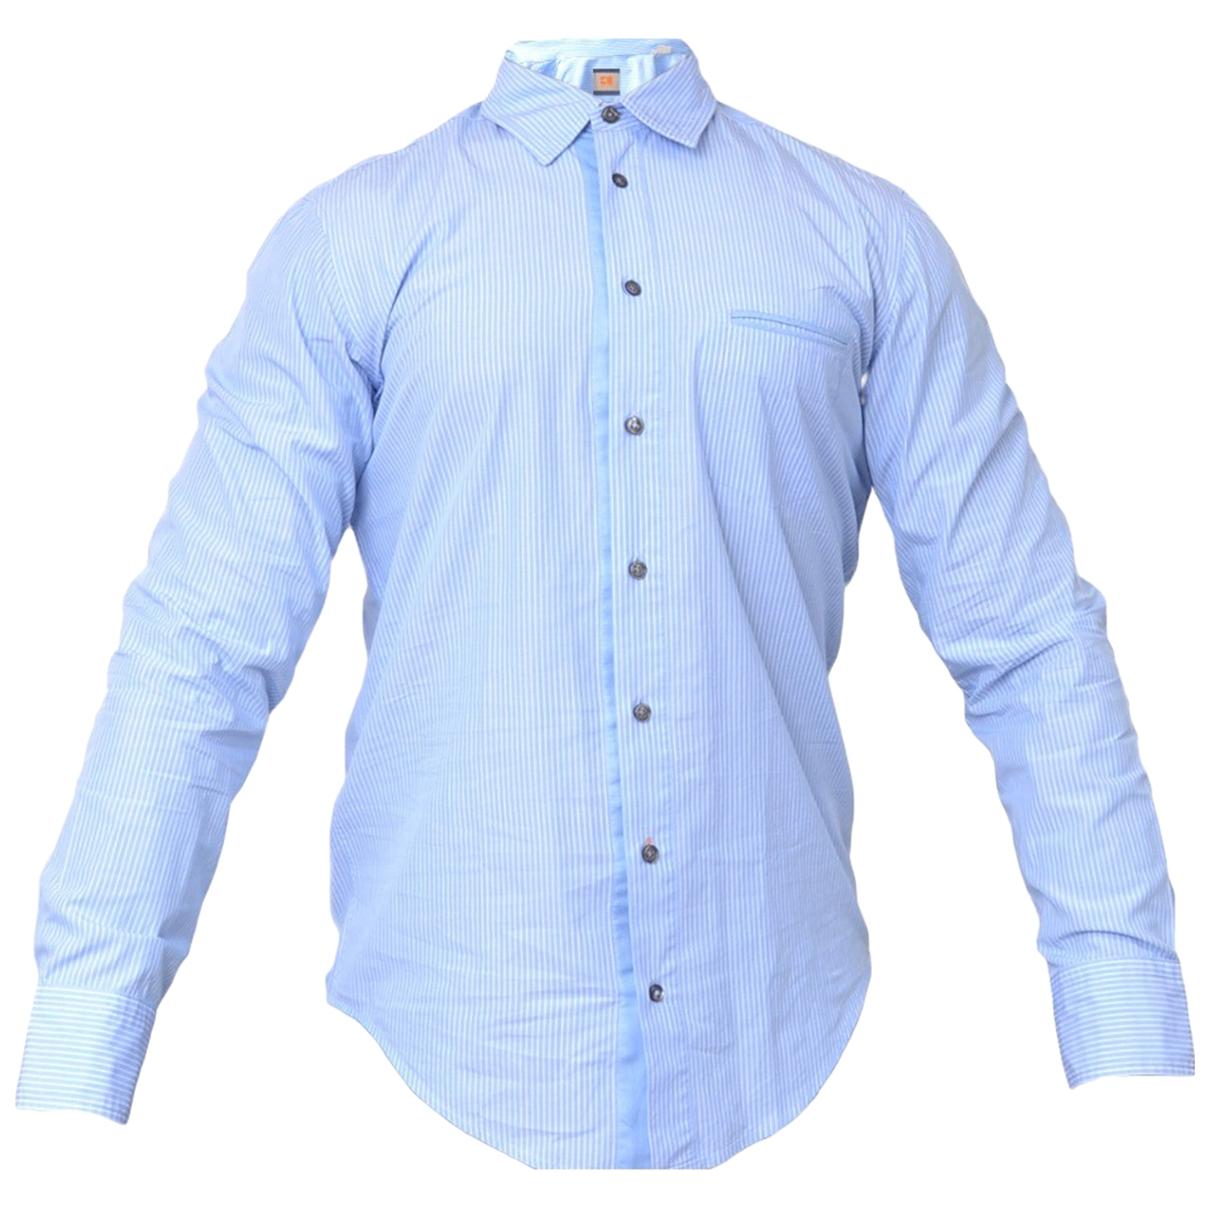 Hugo Boss \N Blue Cotton Shirts for Men L International